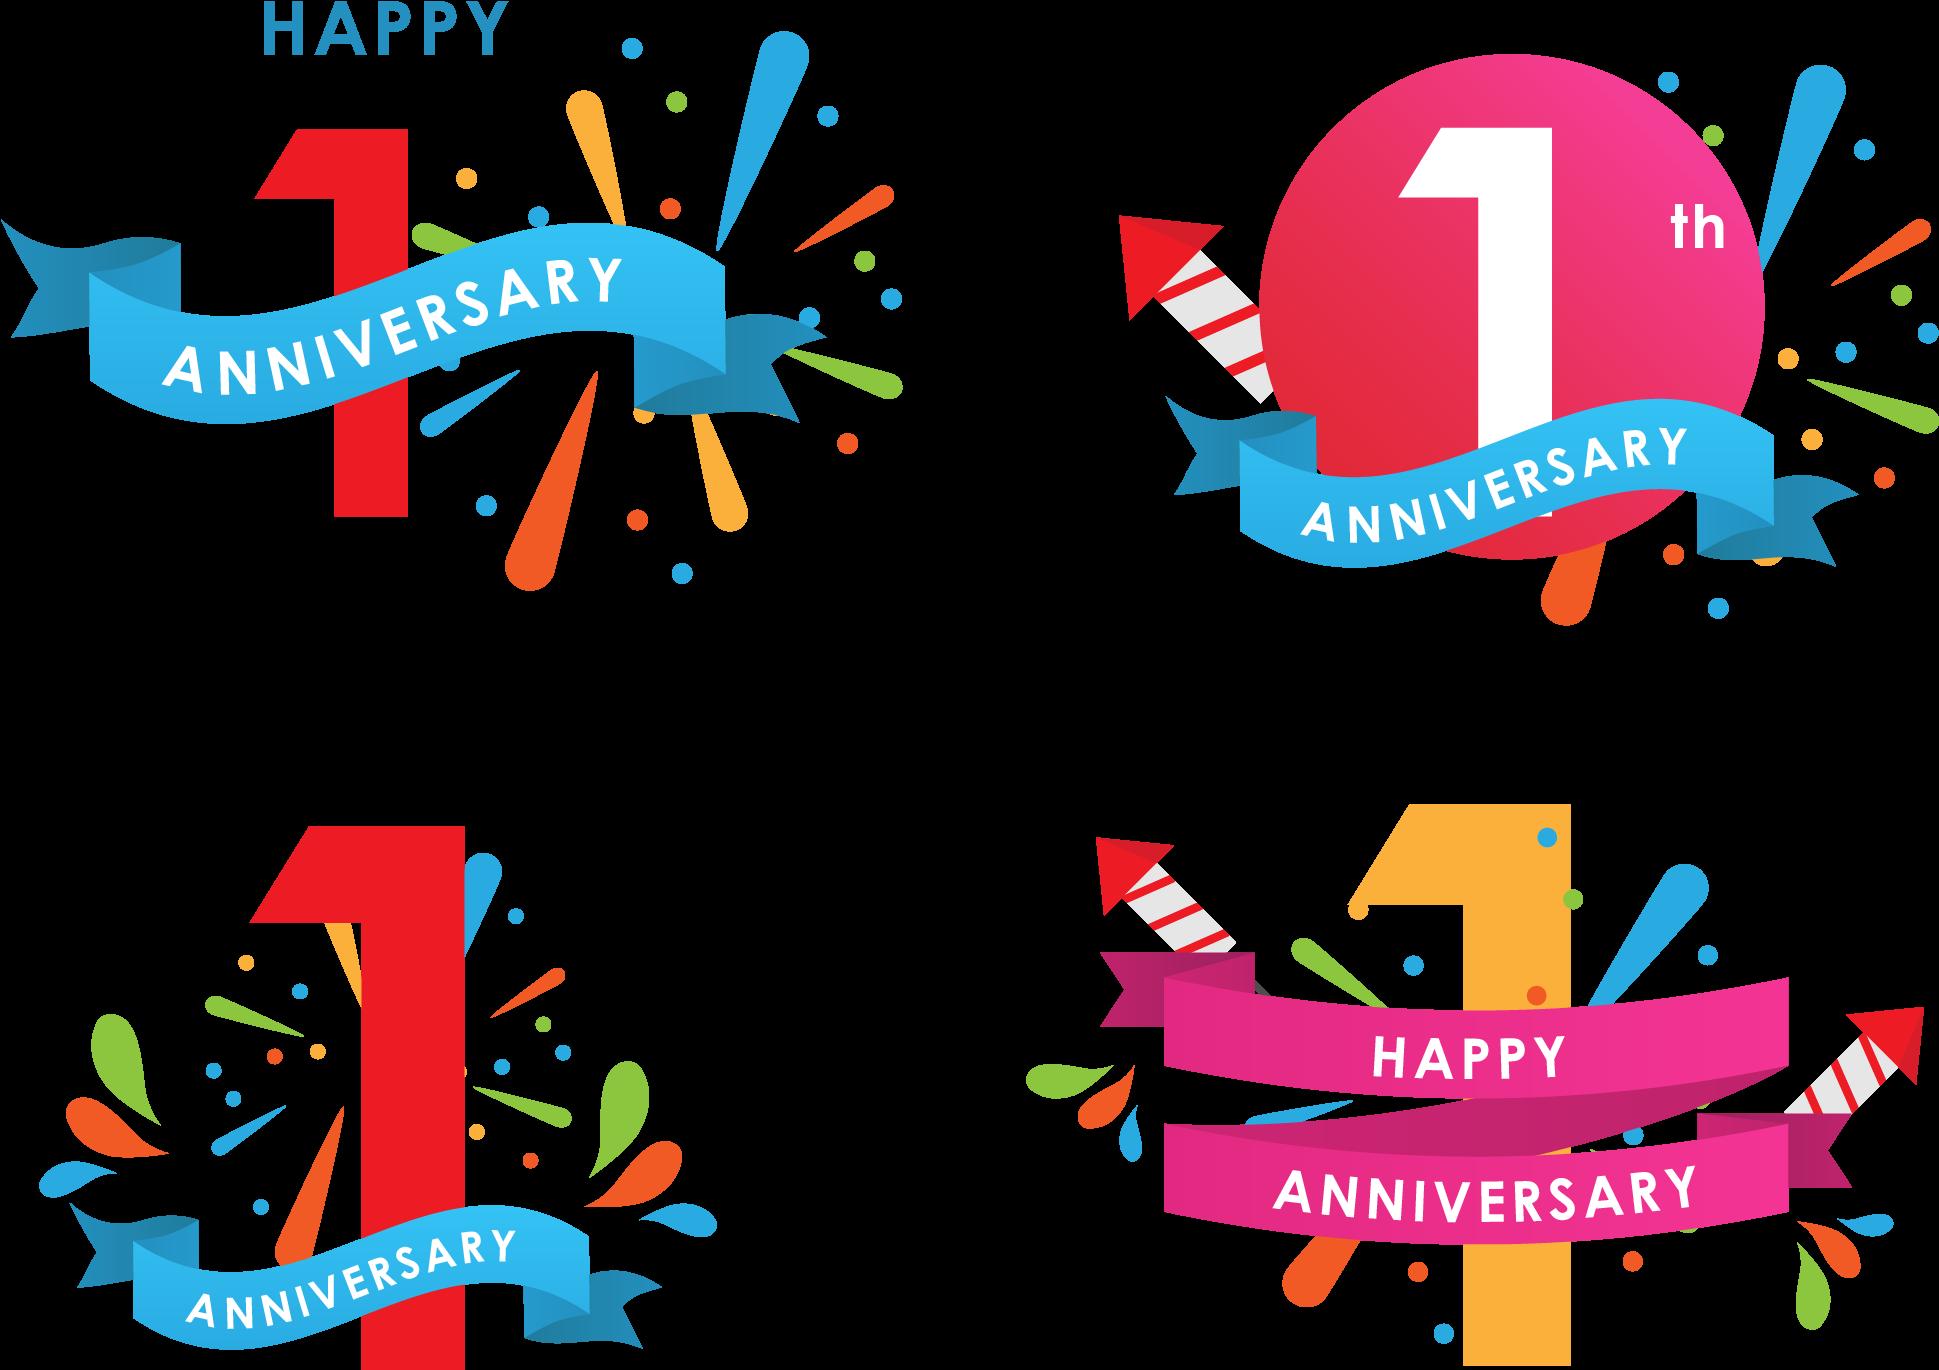 happy anniversary icons 1st anniversary logo png transparent cartoon jing fm 1st anniversary logo png transparent